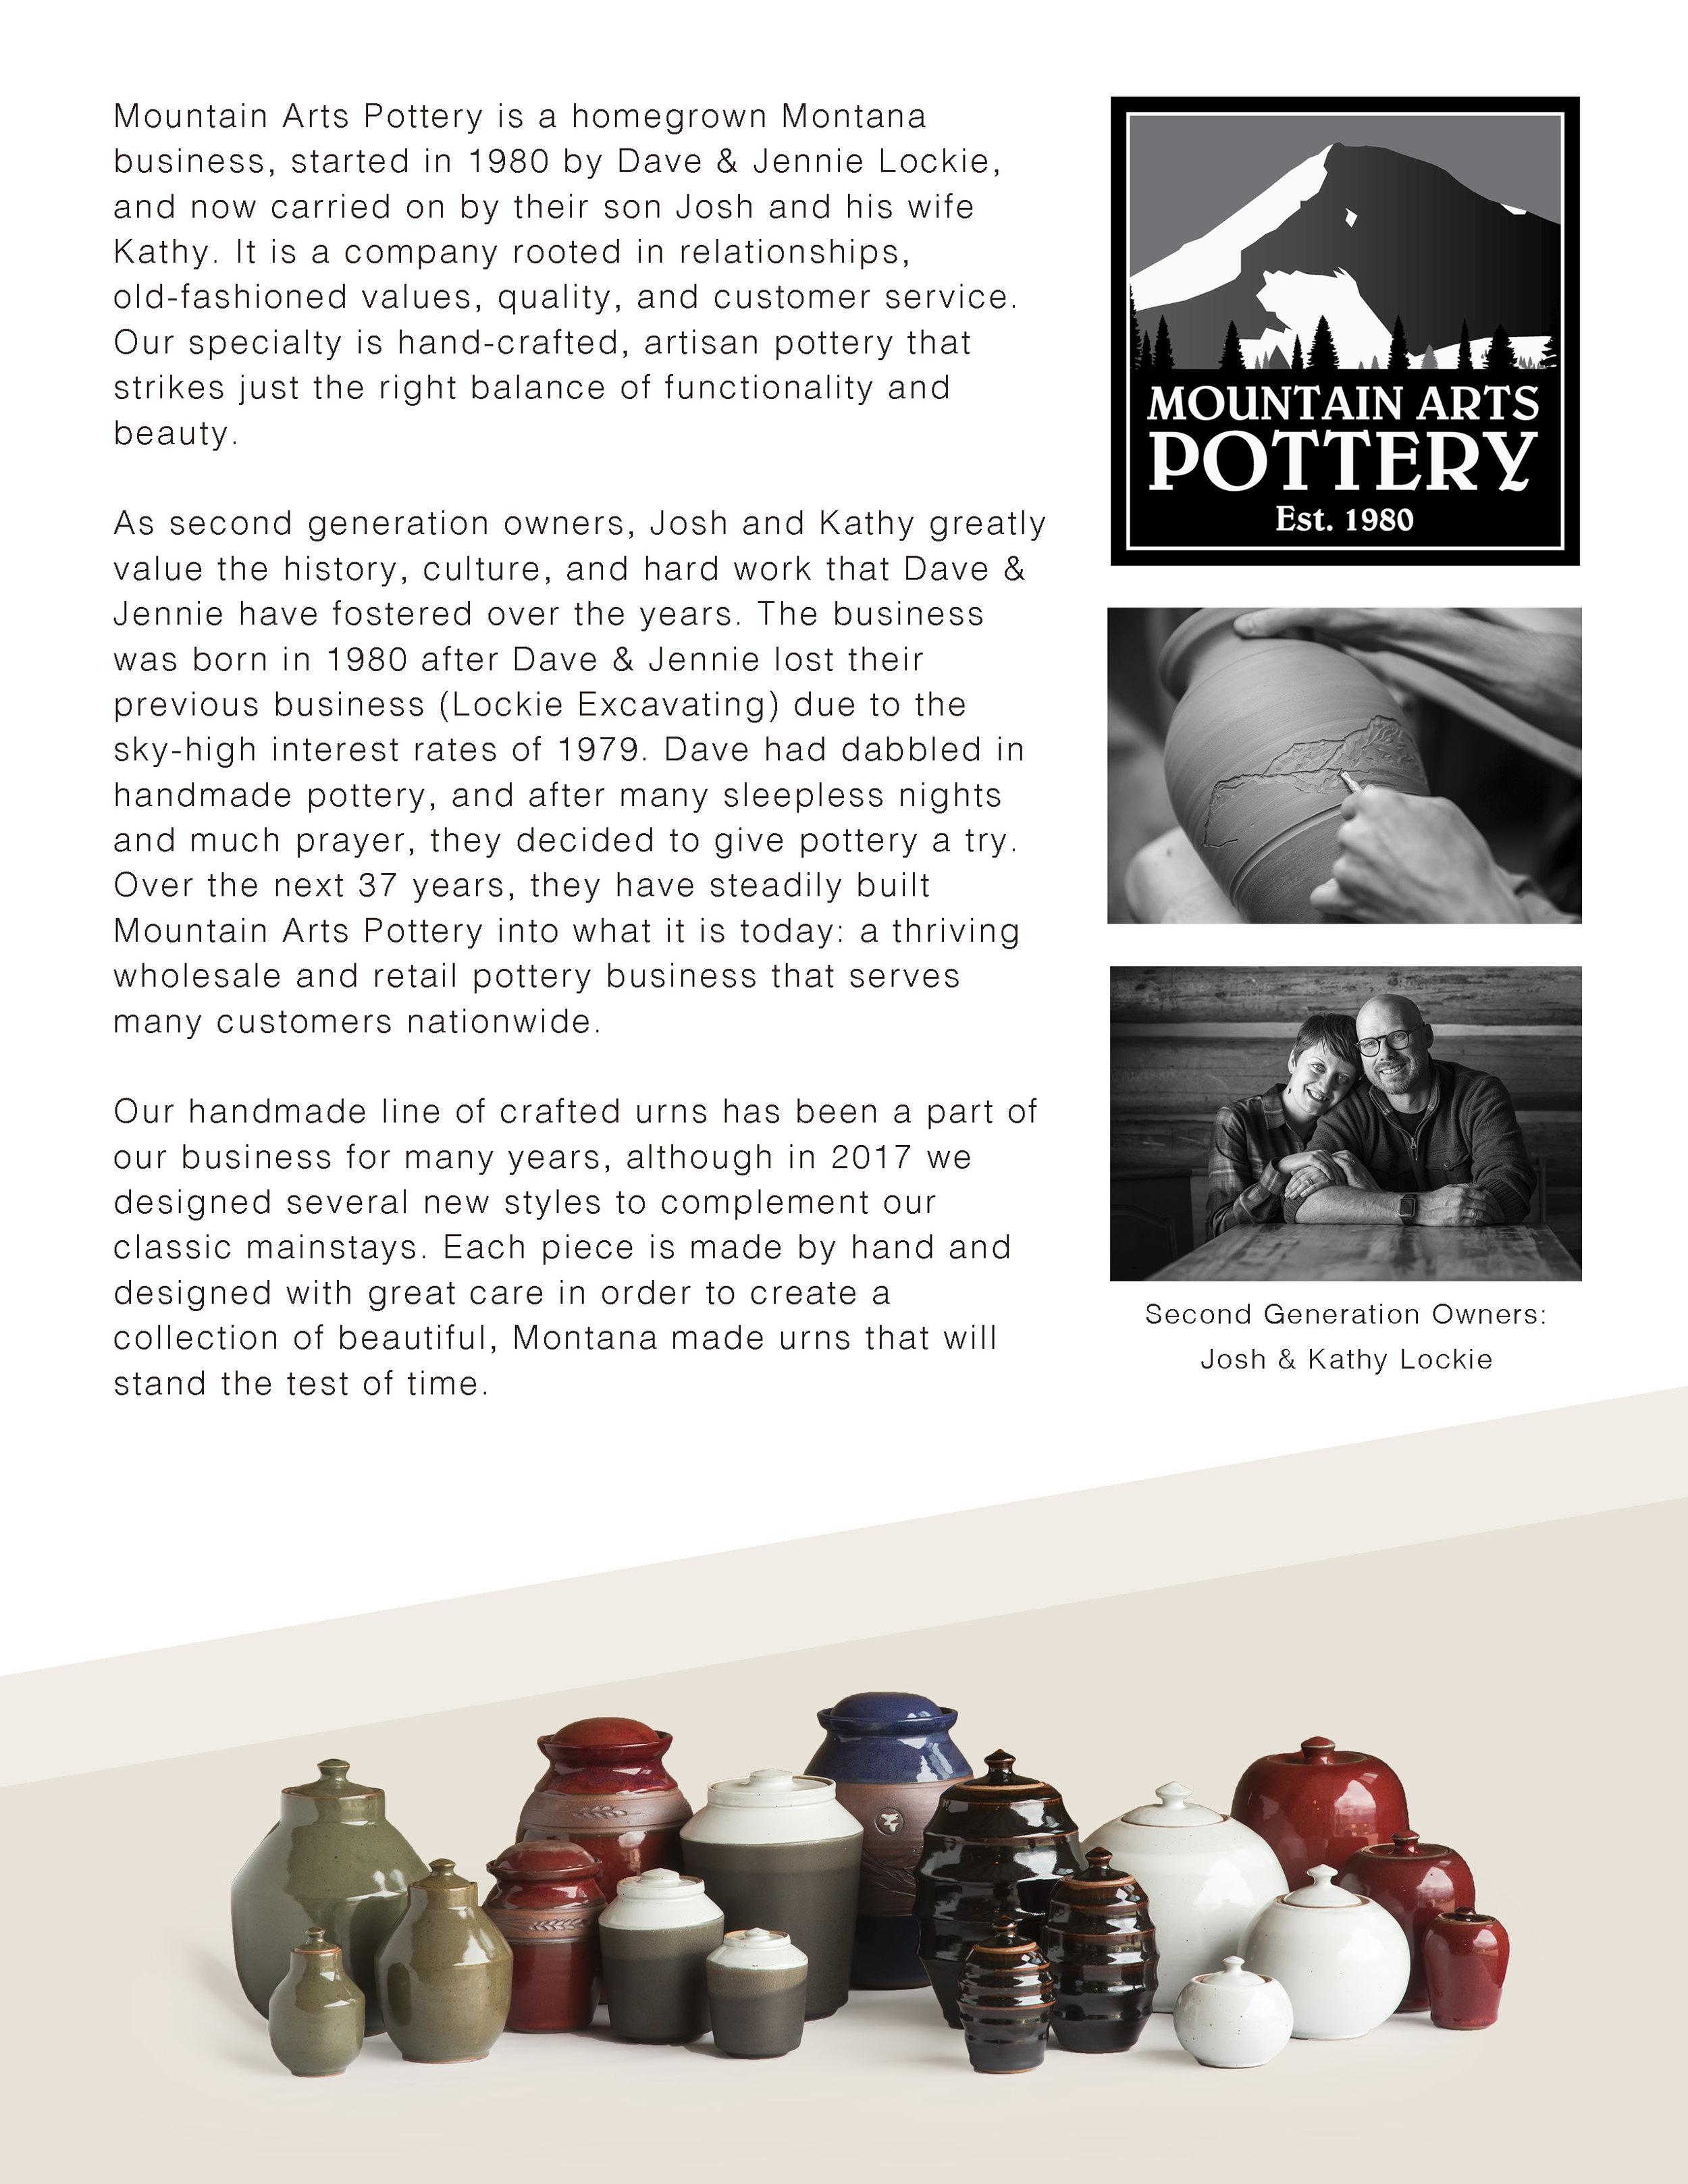 Mountain Arts Pottery Urn Article (1).jpg